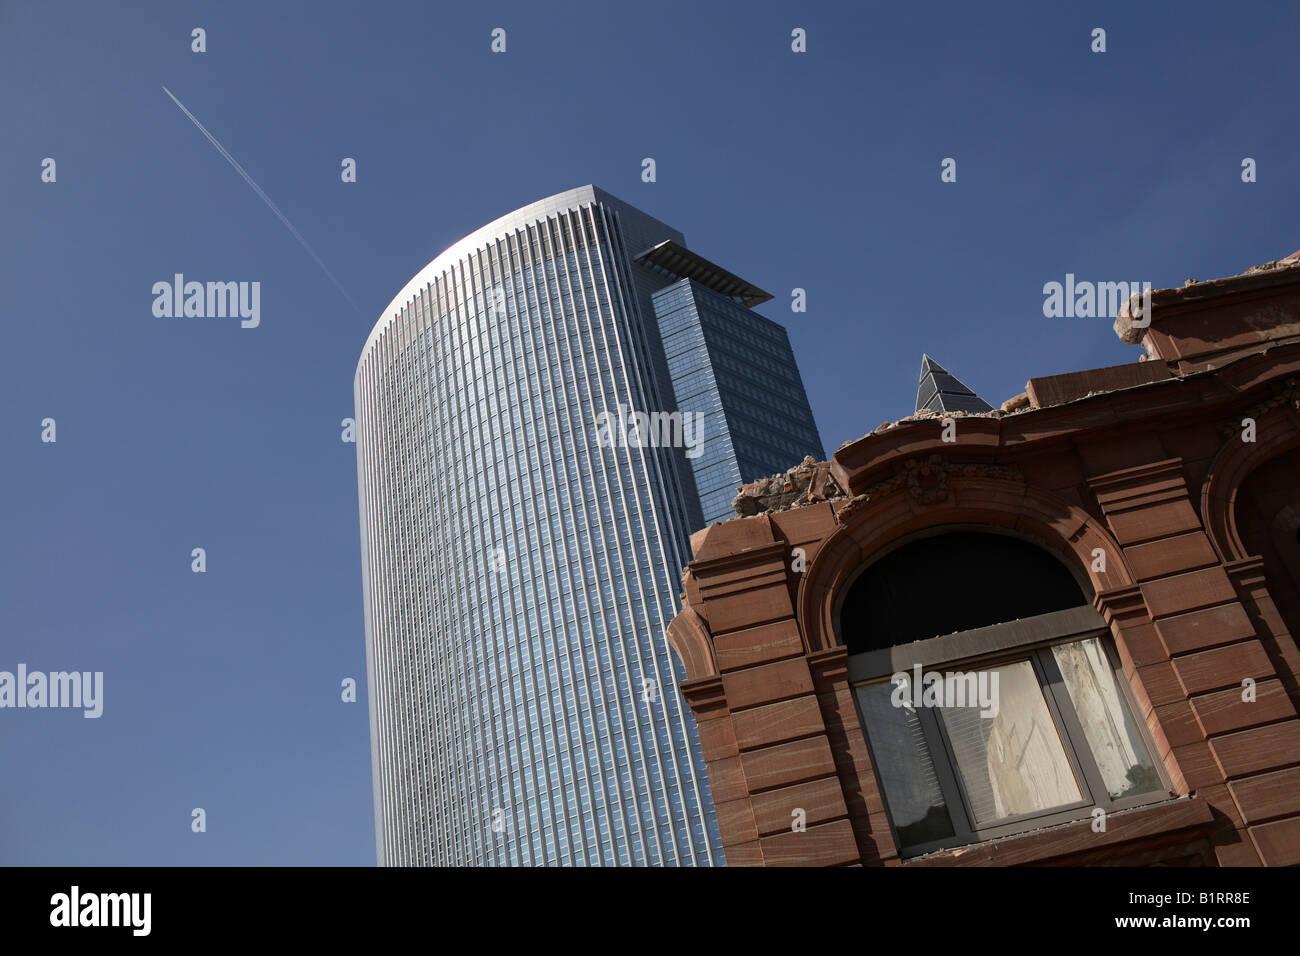 Skyscraper with semi-demolished house, Frankfurt, Hesse, Germany, Europe - Stock Image